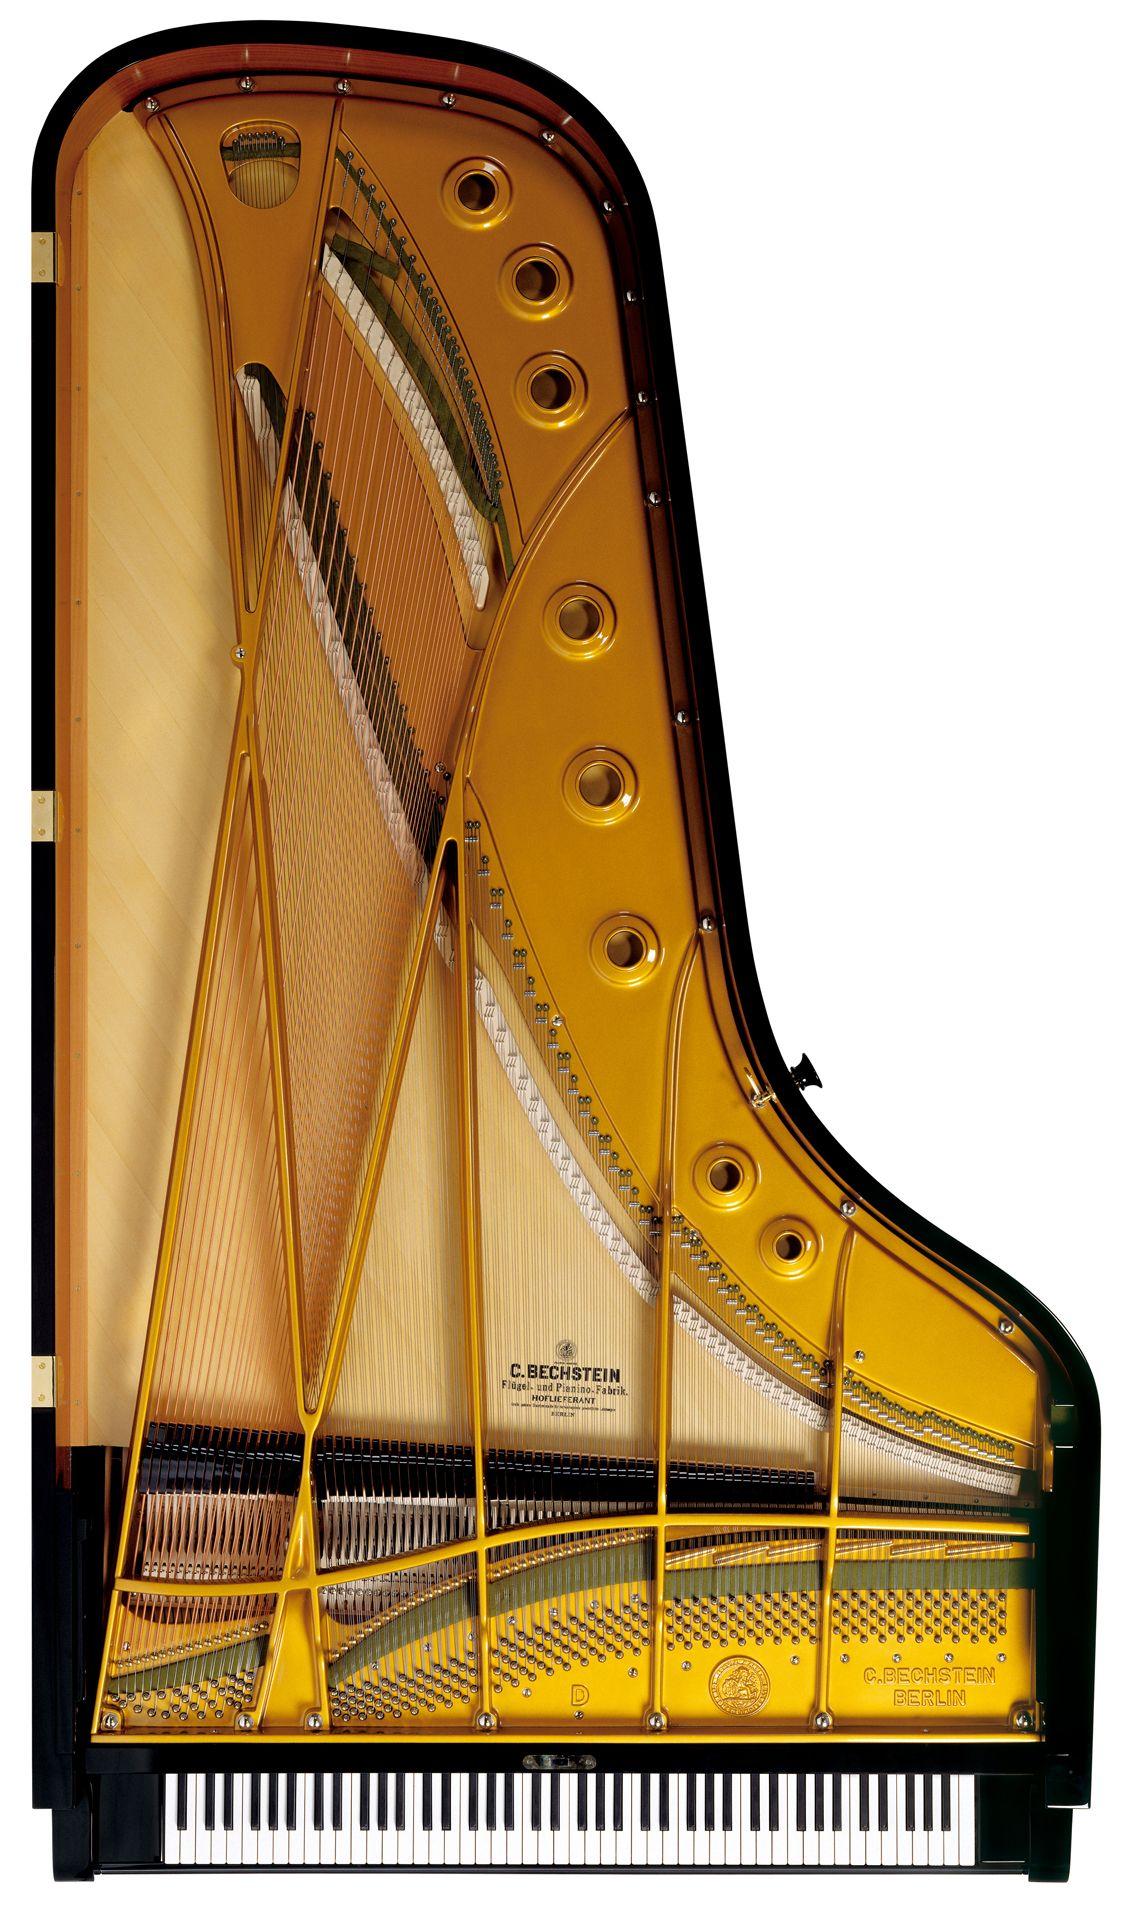 Grand piano top view widescreen 2 hd wallpapers graphic for Produttore di blueprint piano piano